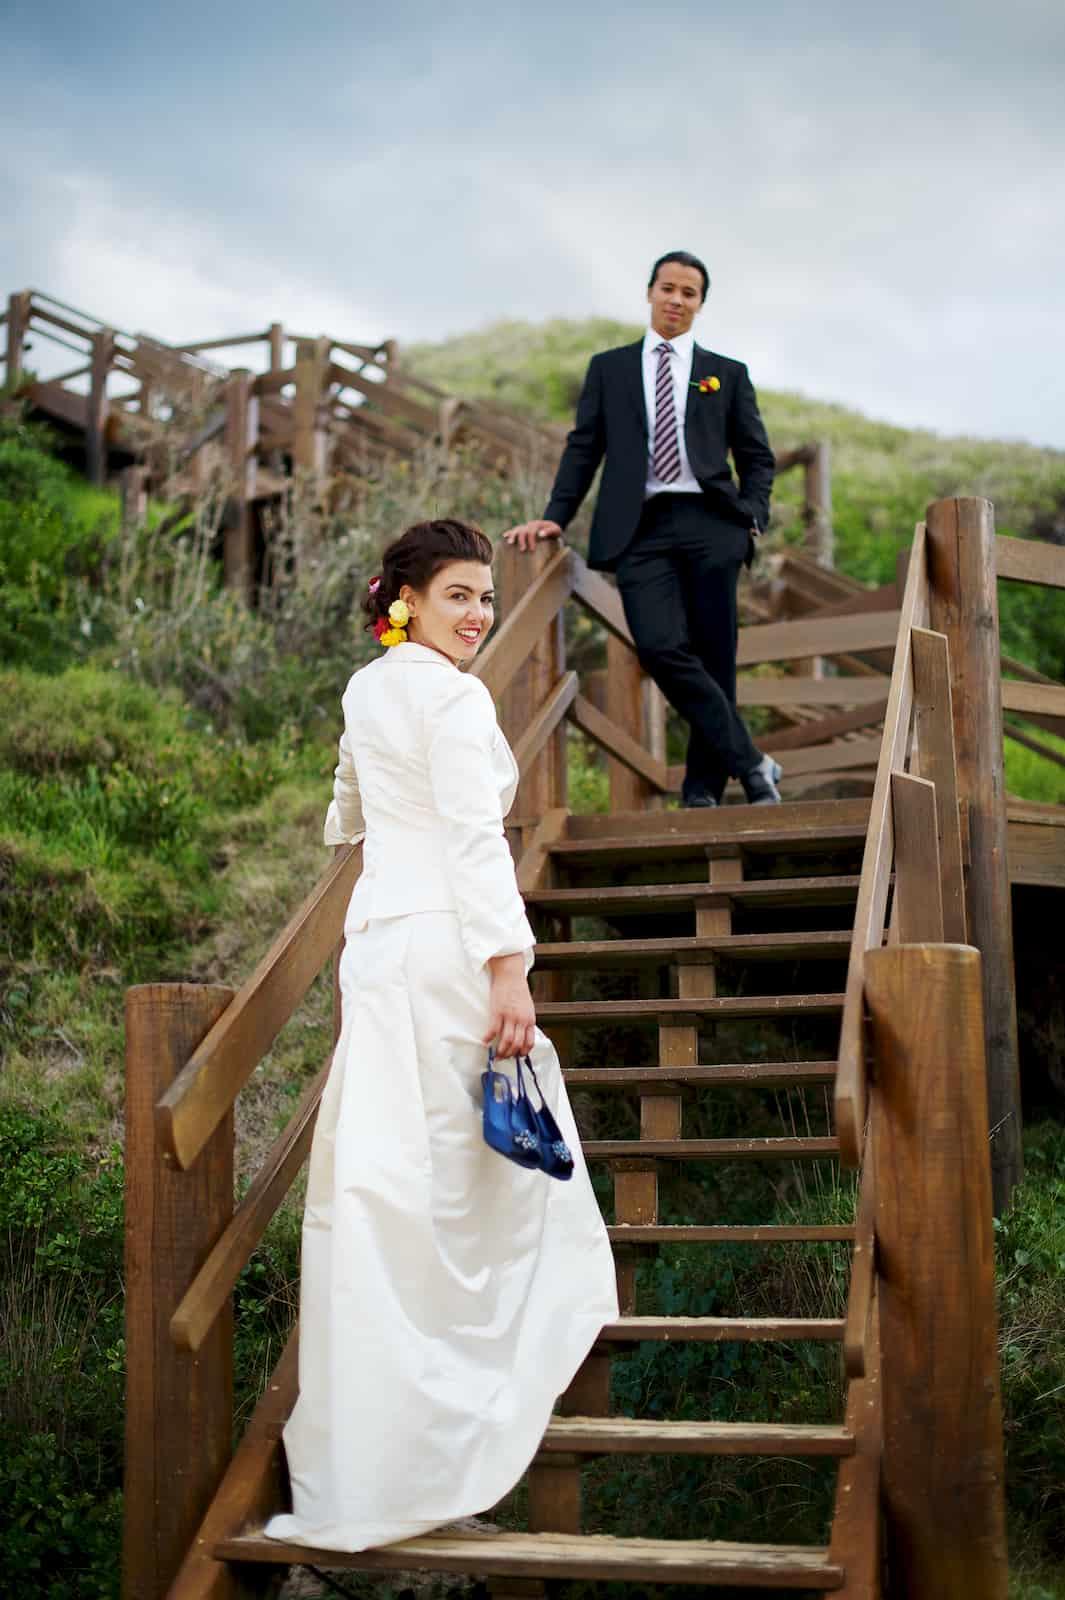 beach wedding winter wedding tuxedo